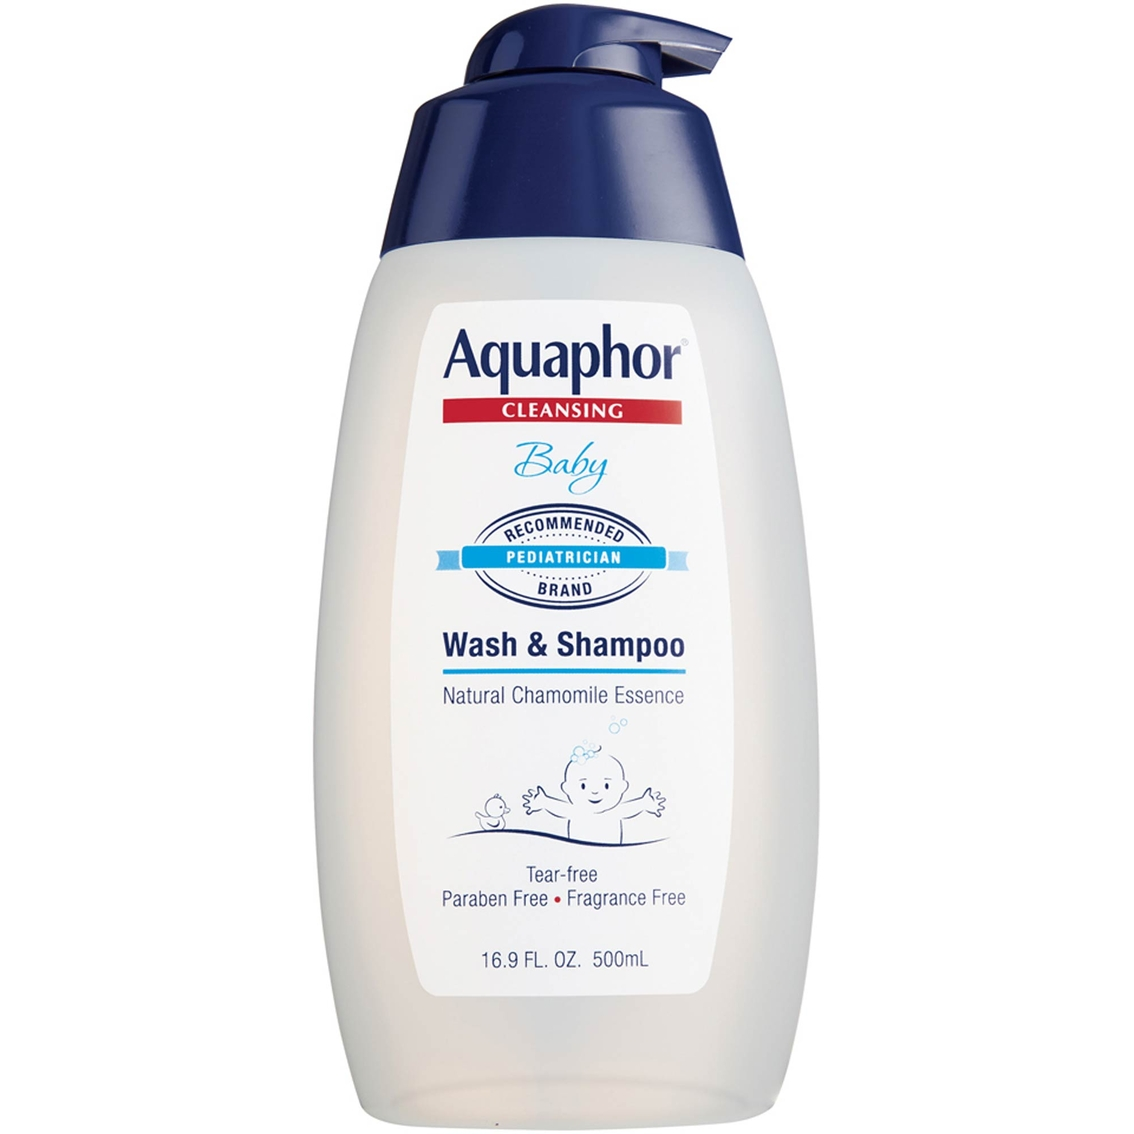 Aquaphor eucerin baby